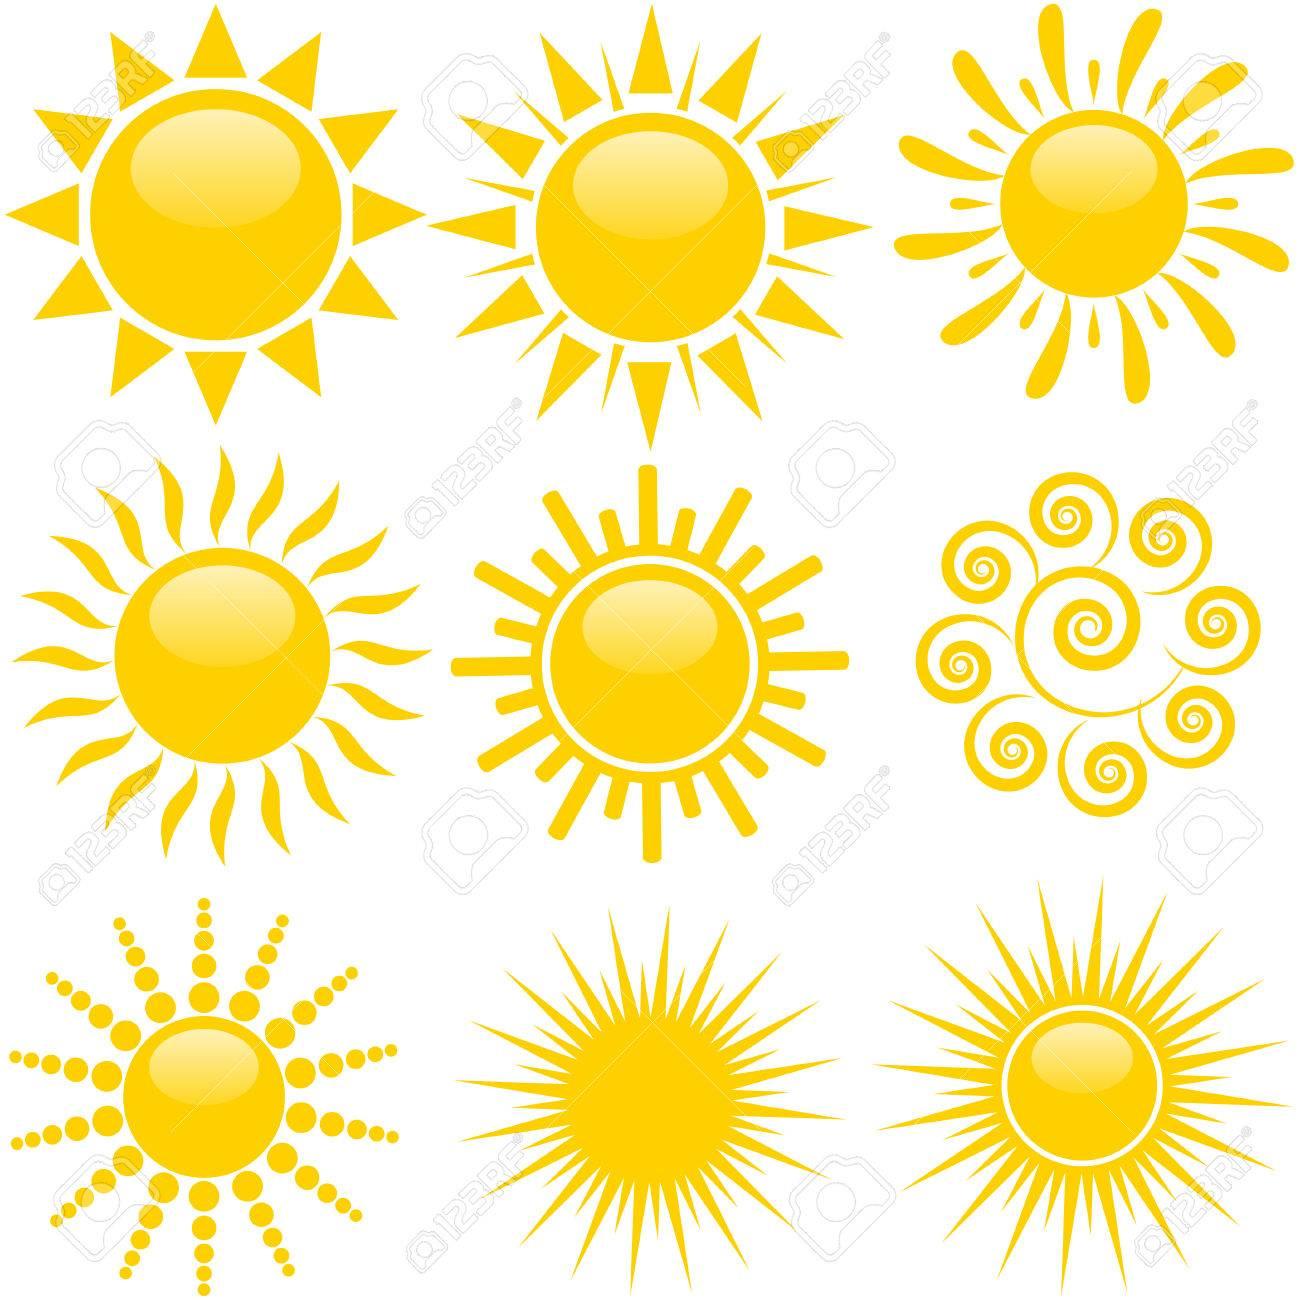 Set of sun icons - 40609115